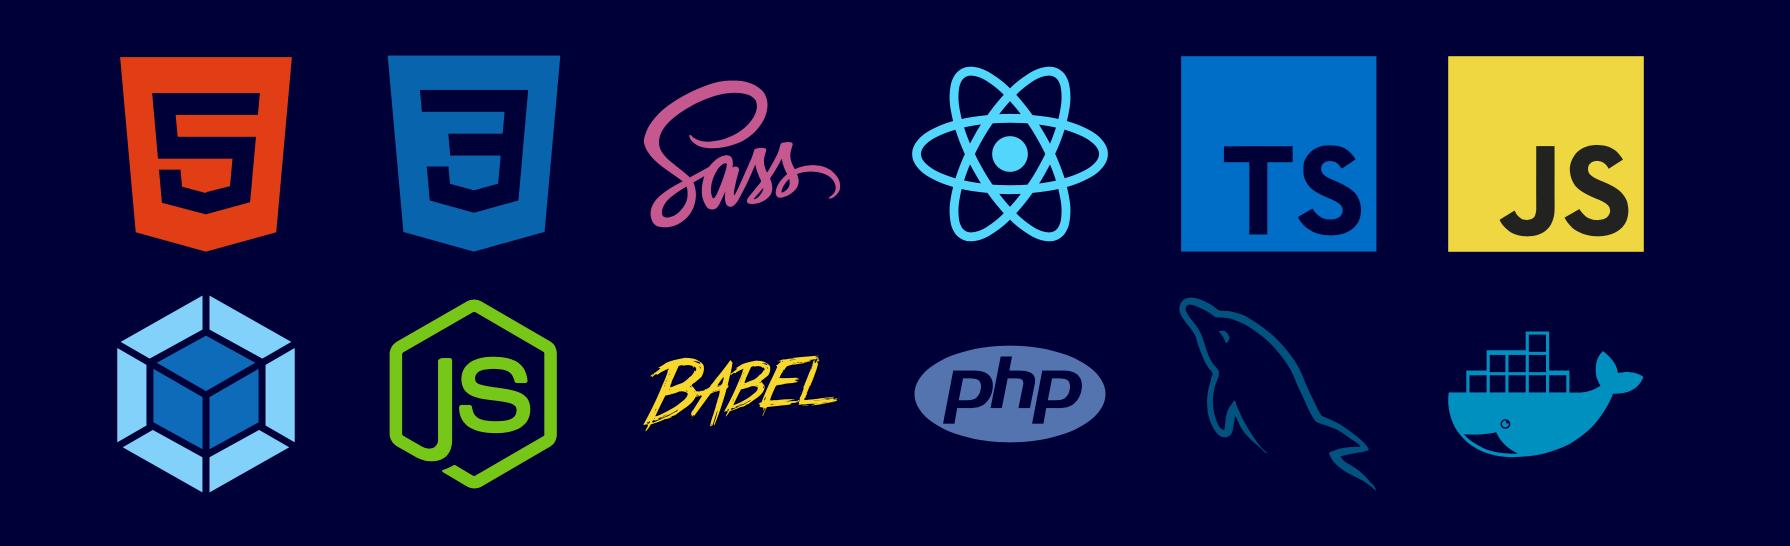 HTML5, CSS3, SASS, React, Typescript, Javascript, Webpack, Node, Babel, PHP, MySQL, Docker